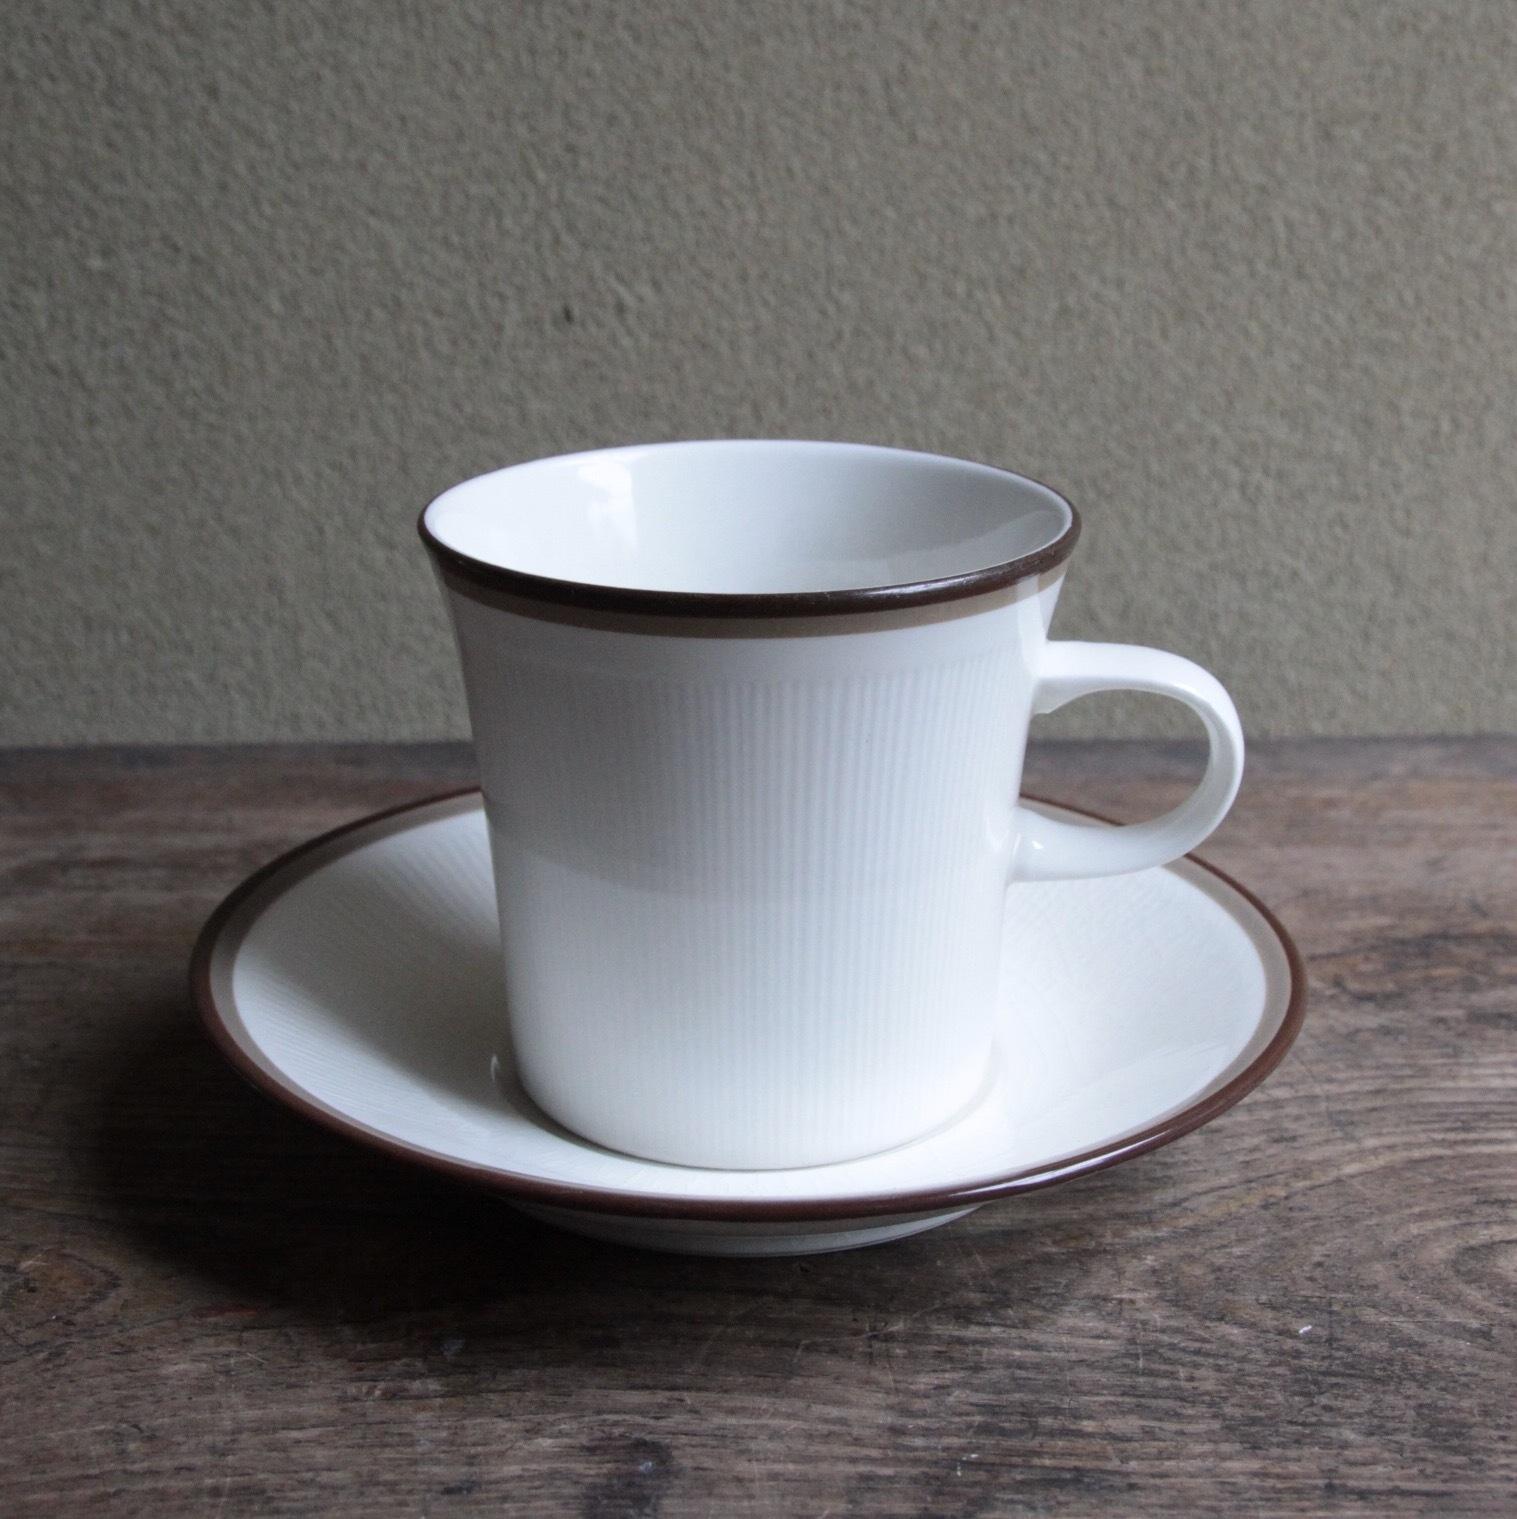 sanwa ブラウンラインのカップ&ソーサー 在庫4客